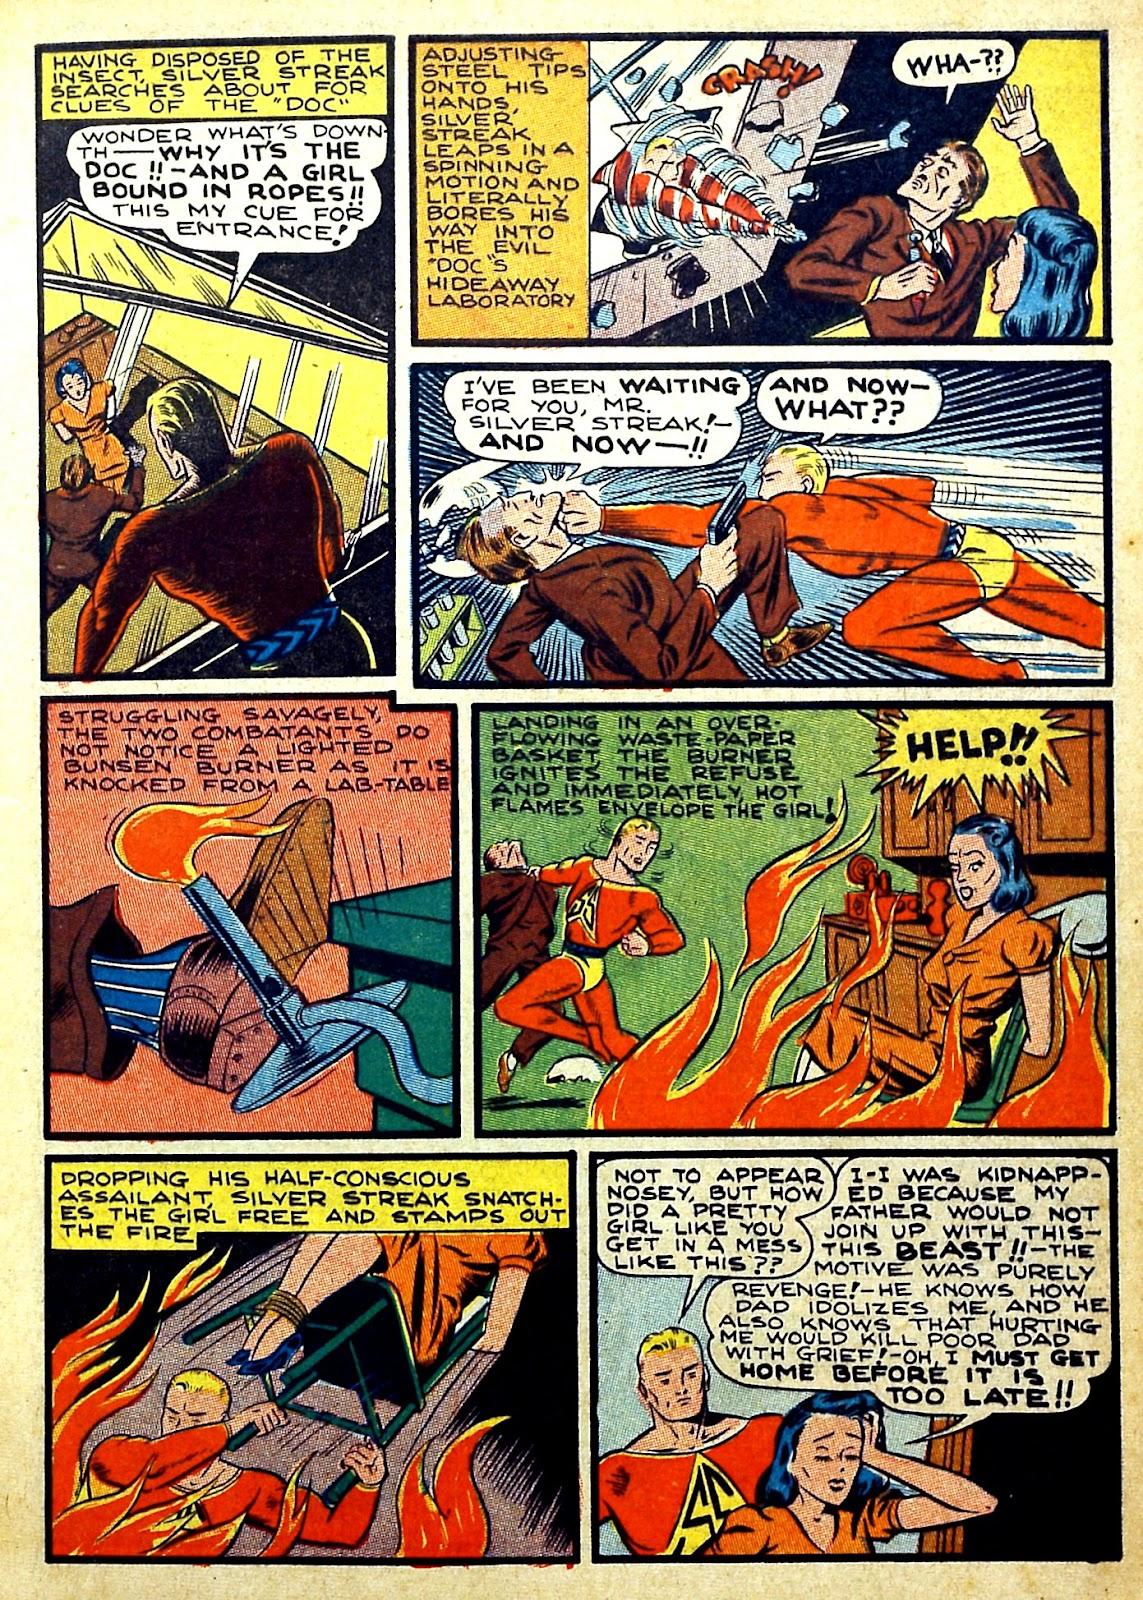 Read online Silver Streak Comics comic -  Issue #22 - 7